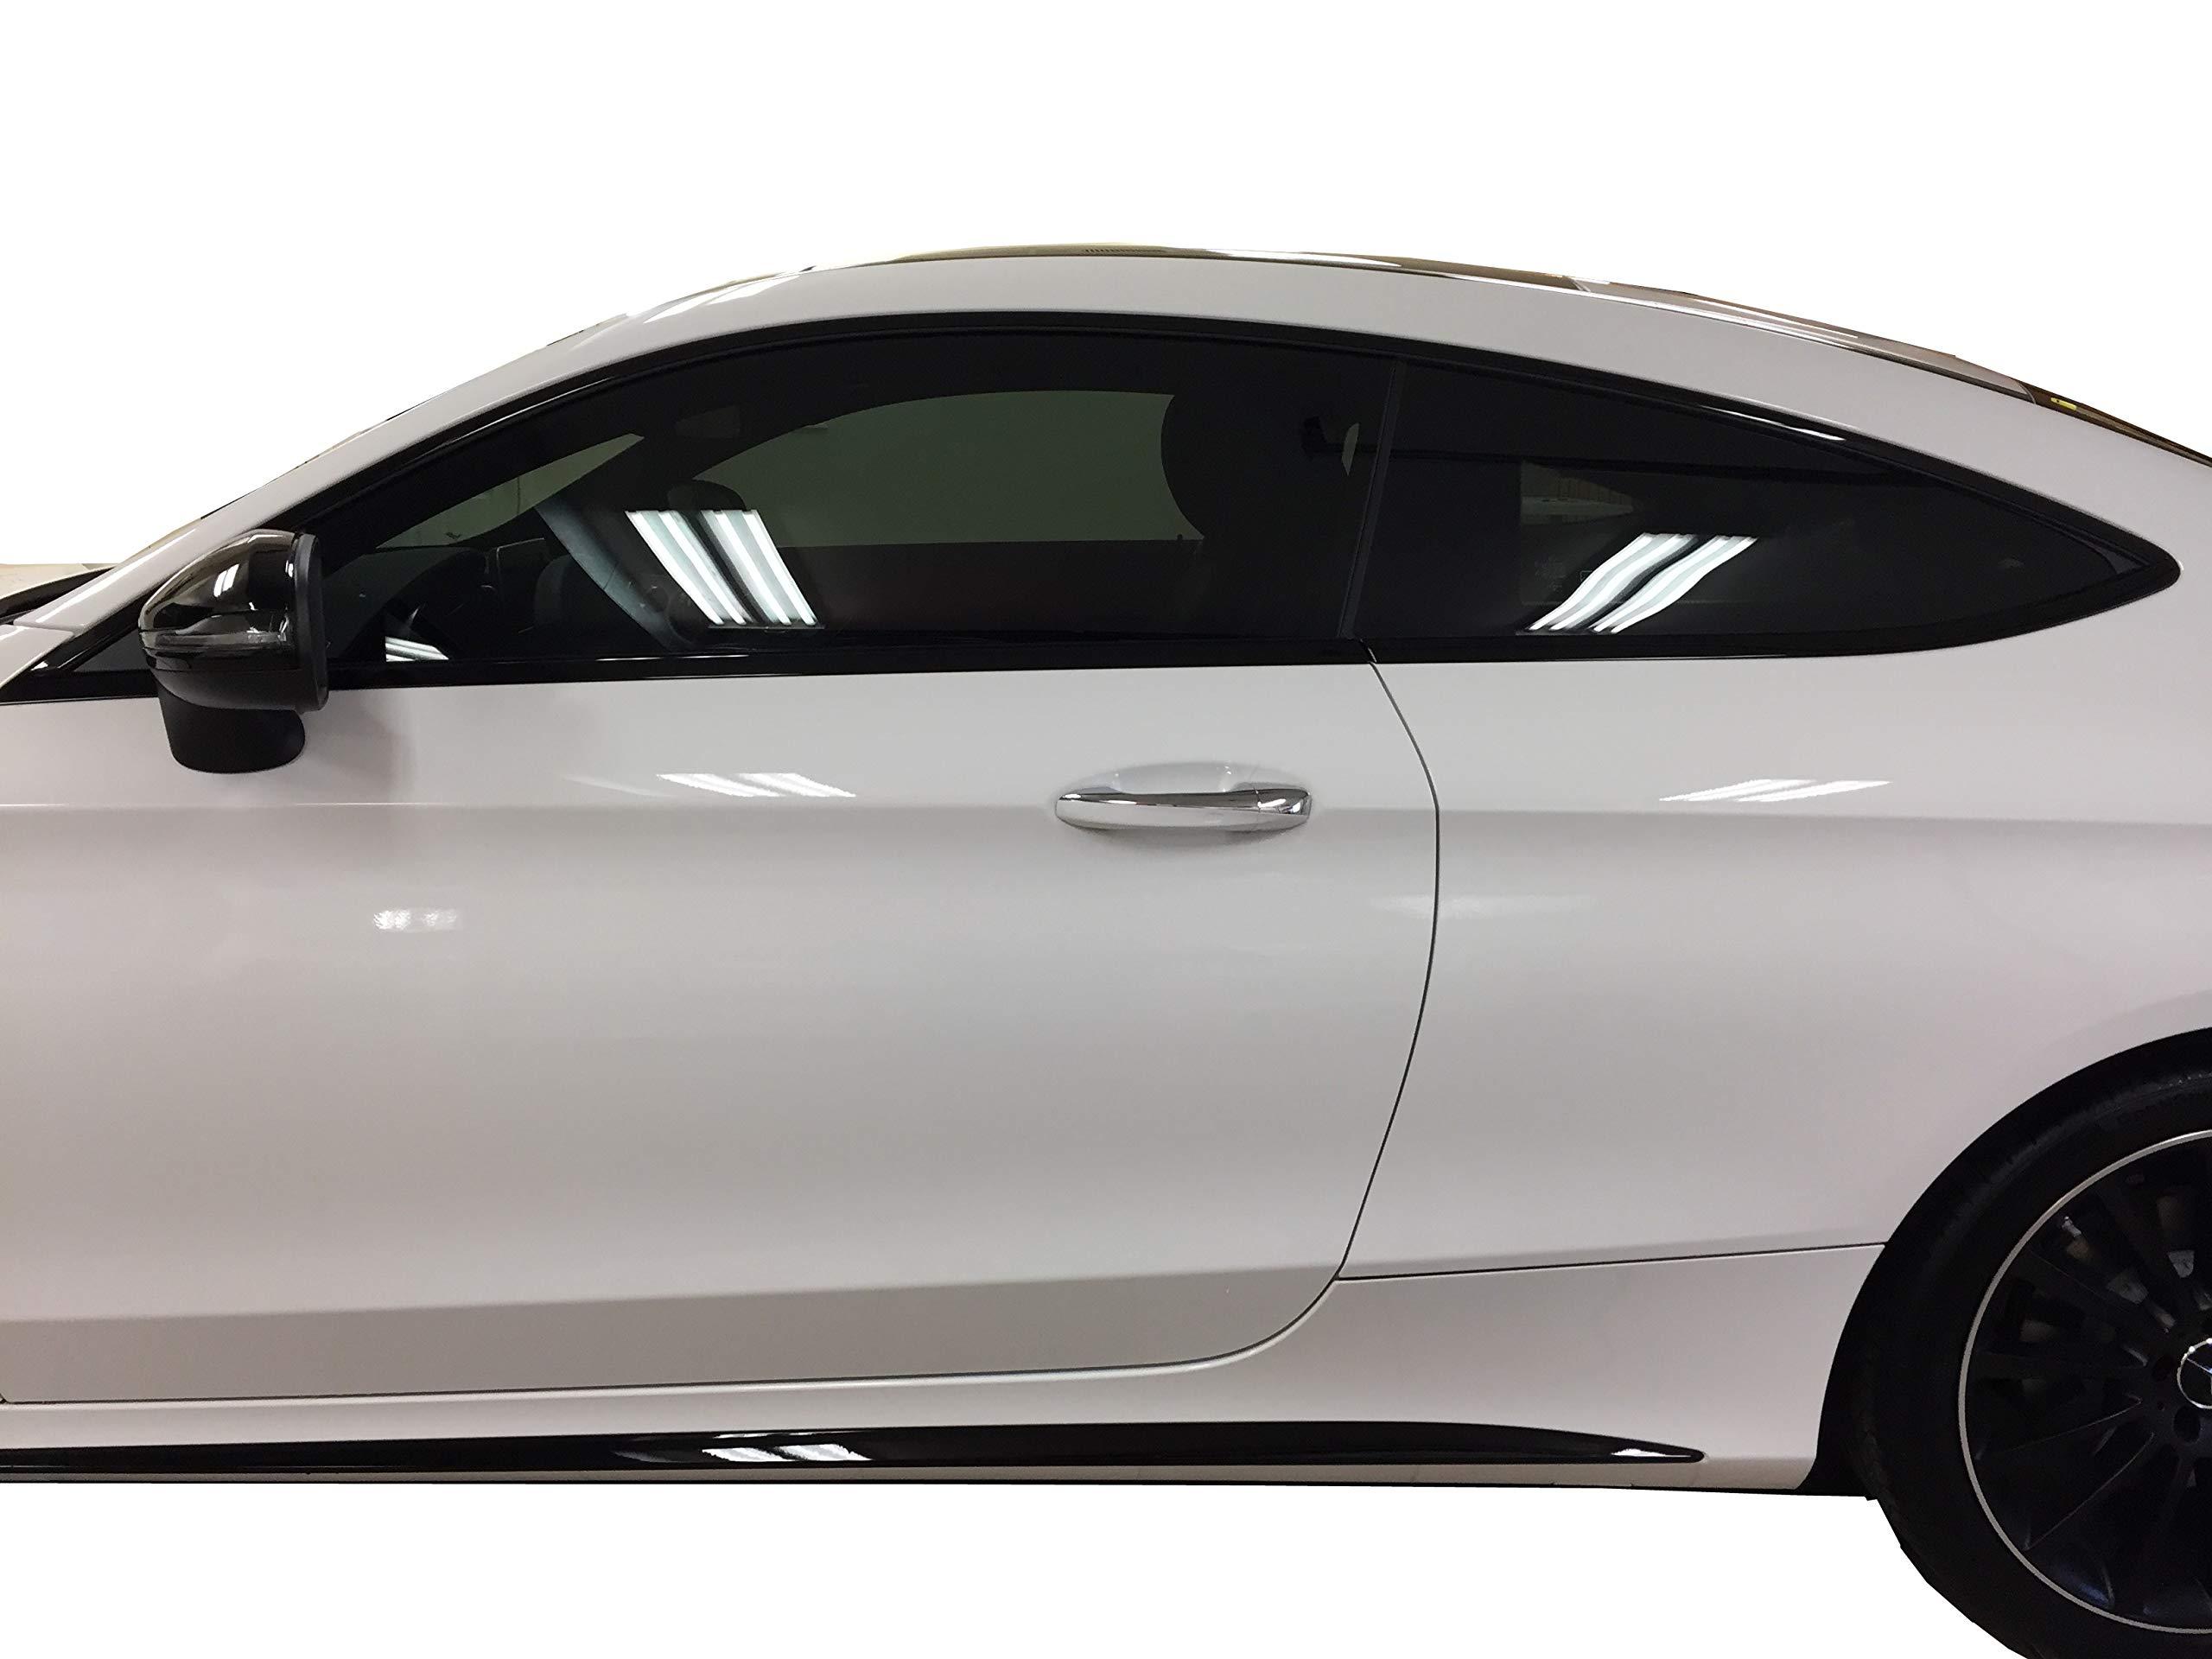 LEXEN 2Ply Premium Carbon 20'' X 100FT Roll Window Tint Film Auto Car (5% Limo (Darkest Shade)) by LEXEN (Image #5)